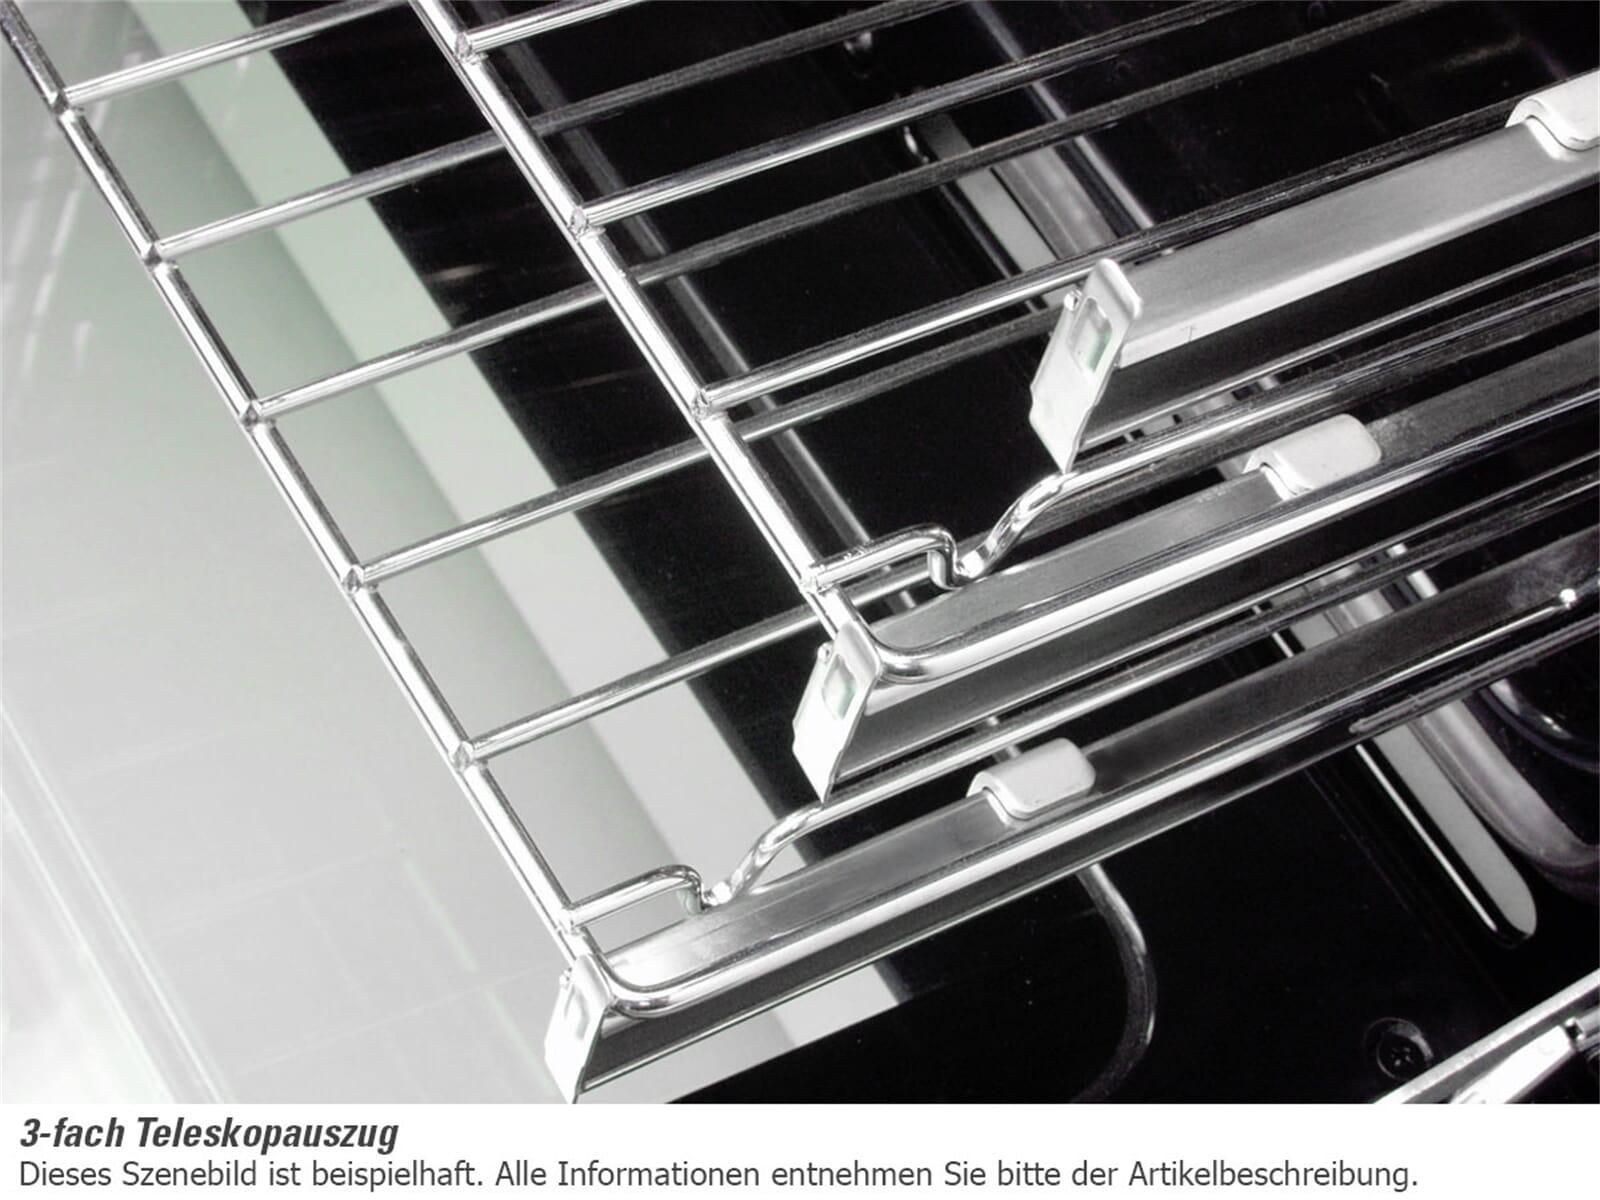 Oranier EBP 9980 Pyrolyse Backofen Edelstahl